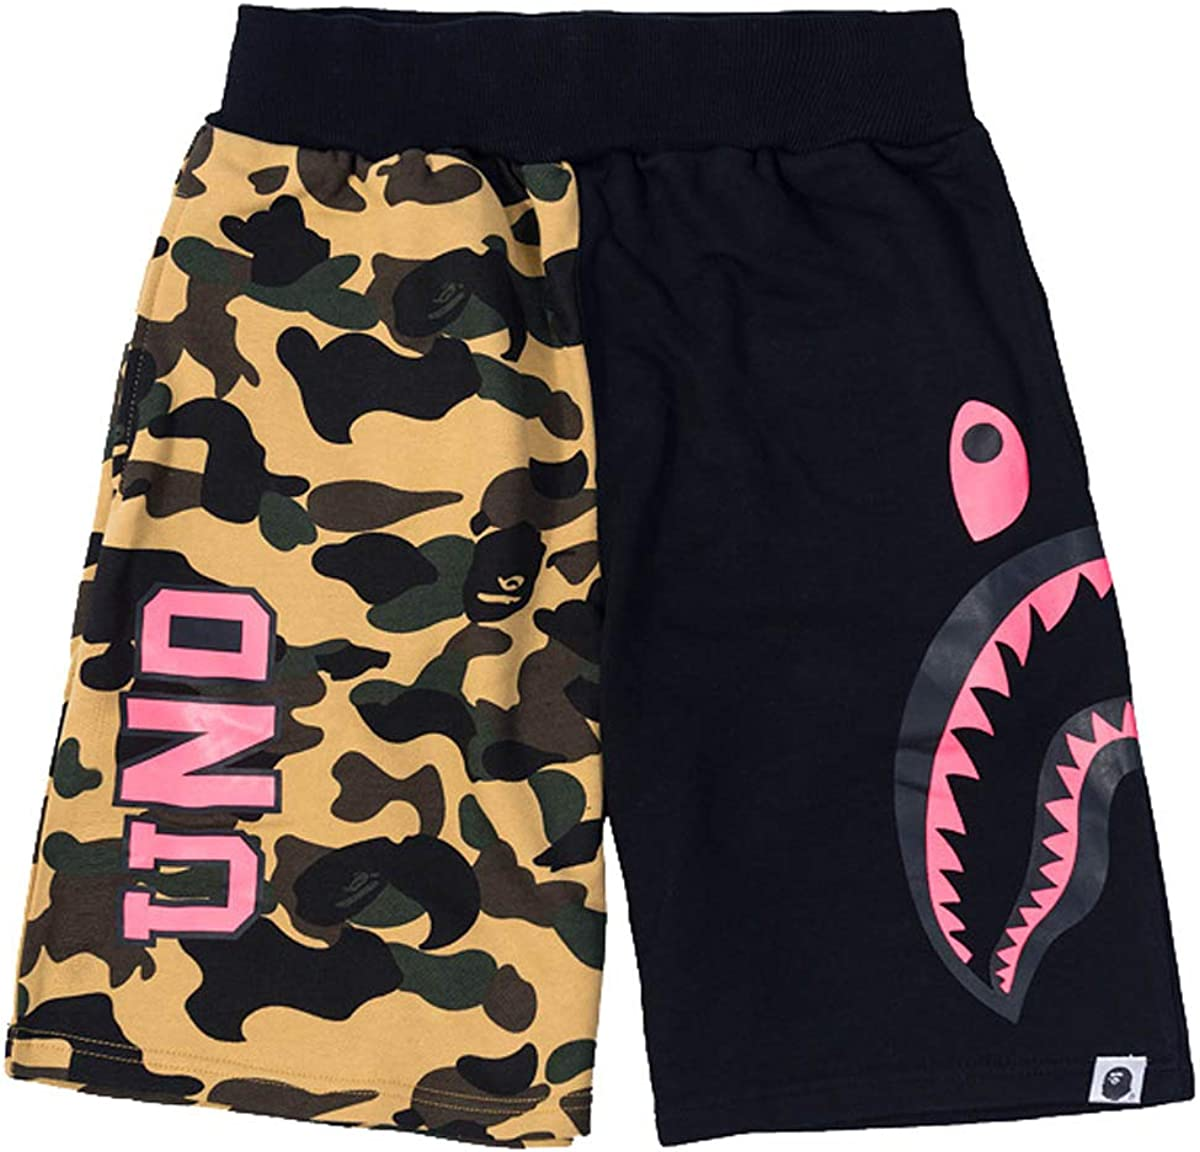 Hot A Bathing Ape Men's/Women's Bape Shark Jaw Shorts Camo Print Color Pants Summer Beach Pants